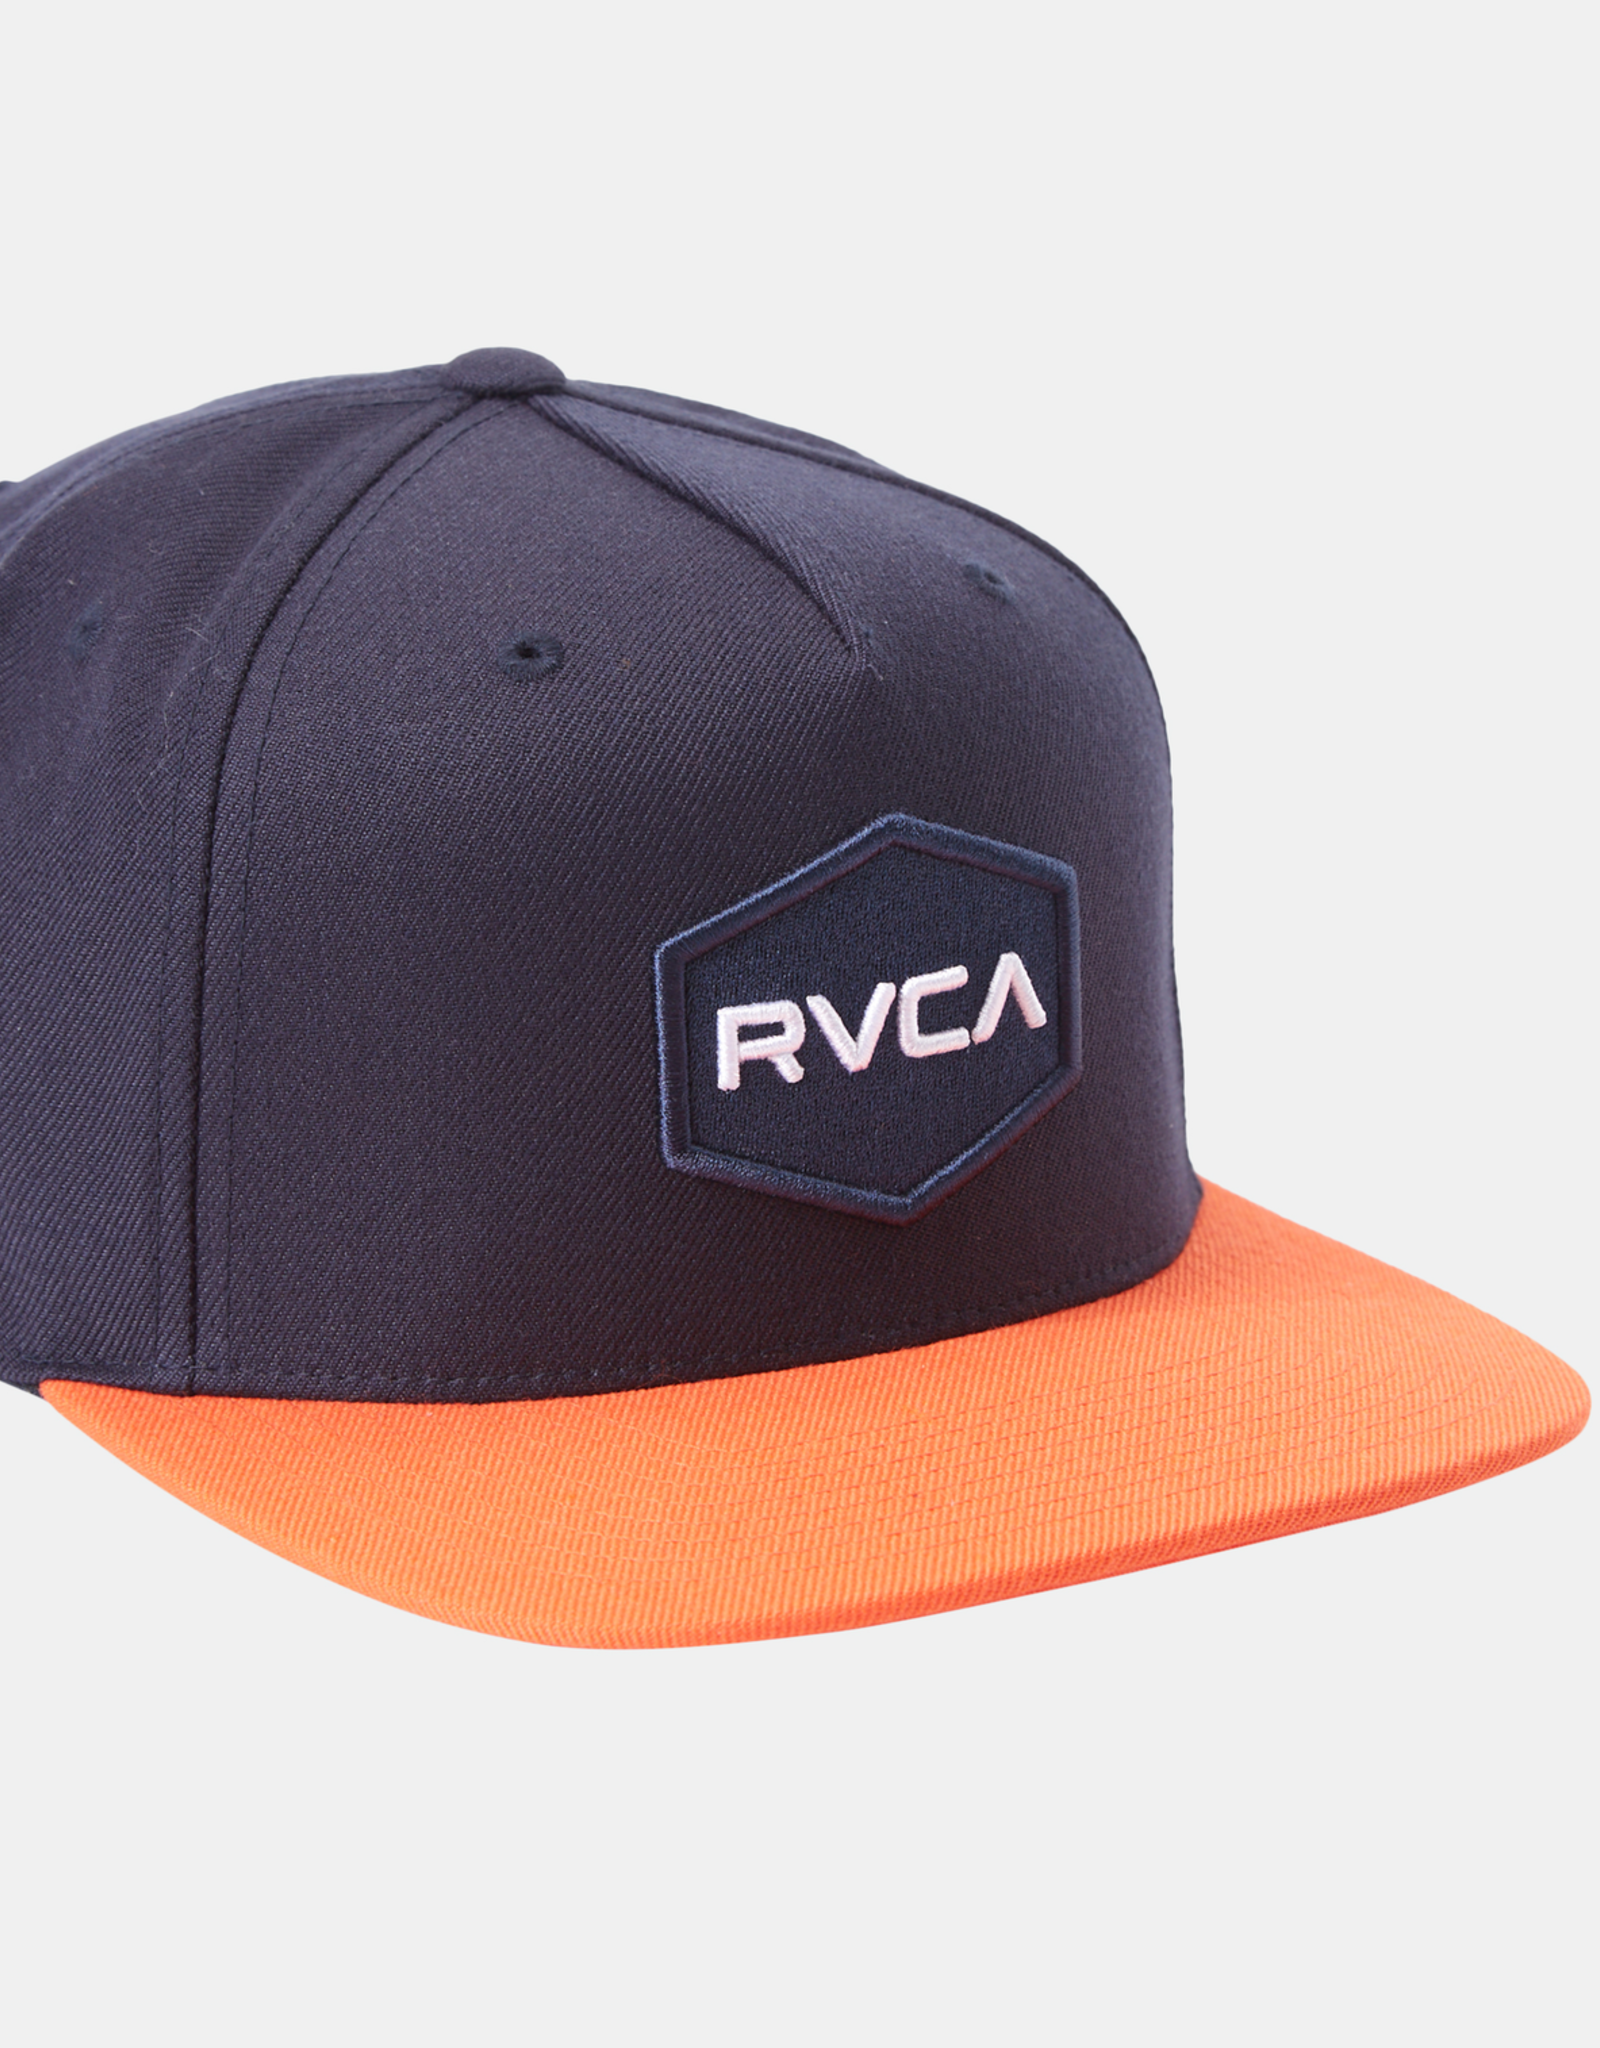 RVCA Commonwealth SN MDY